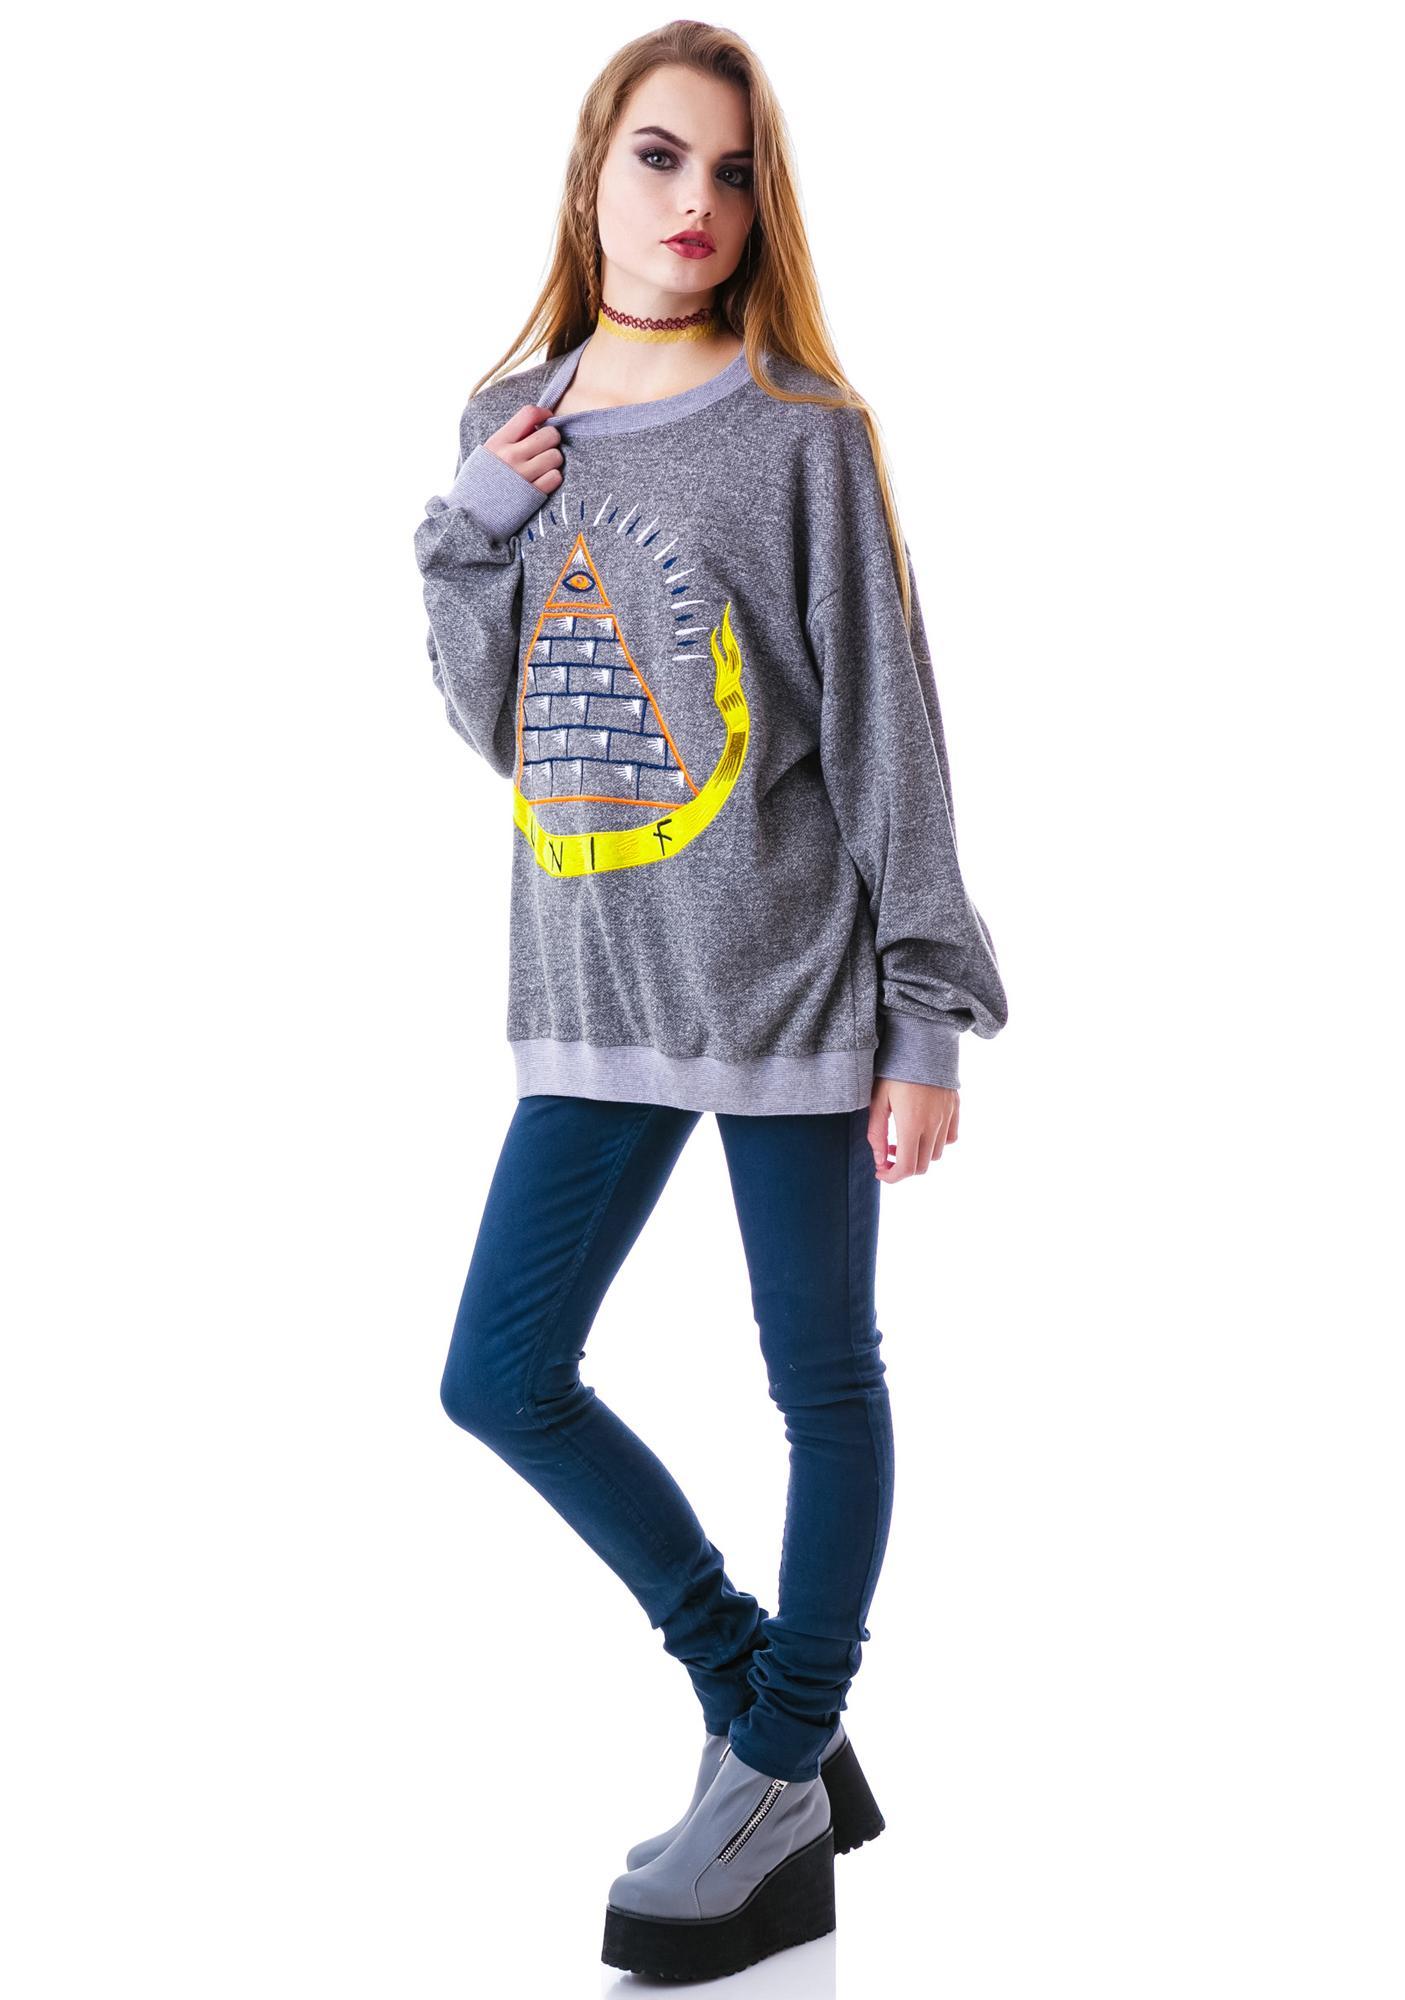 UNIF Cairo Sweatshirt